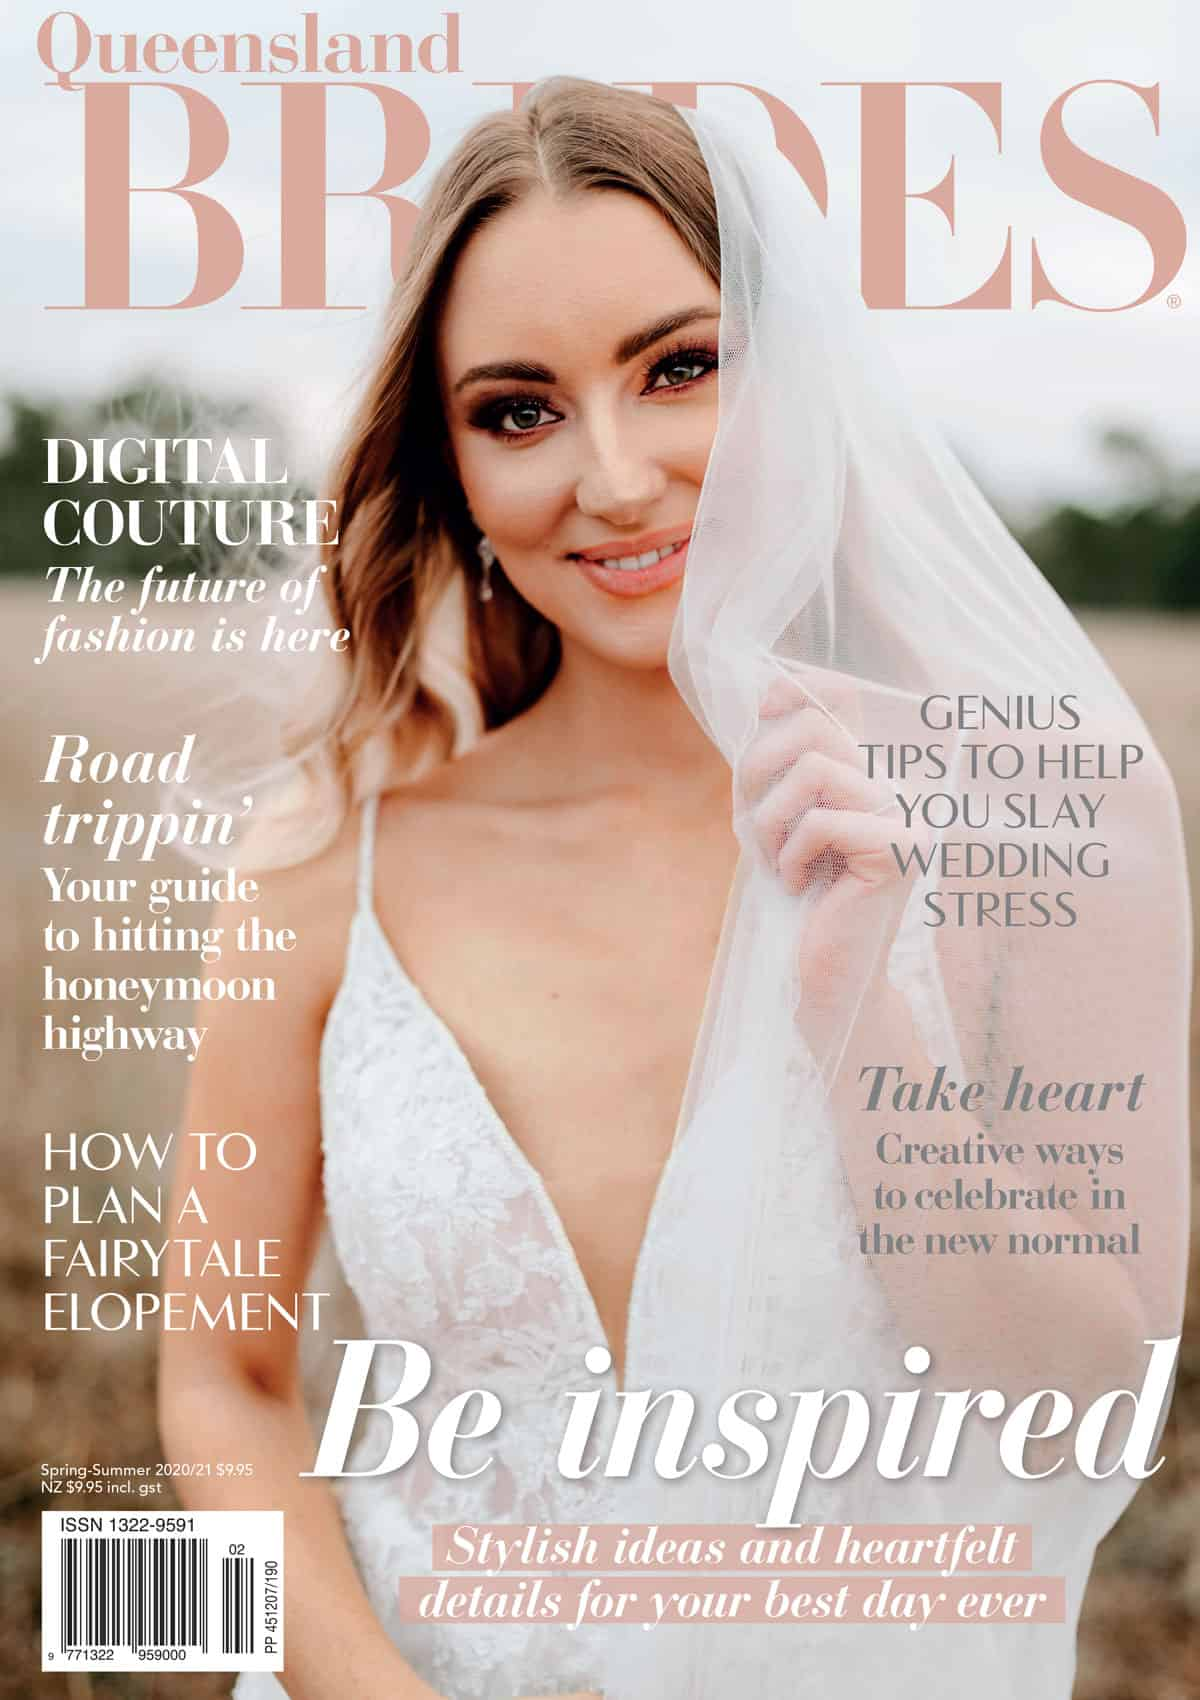 Queensland Brides magaizne spring summer 2020 front cover